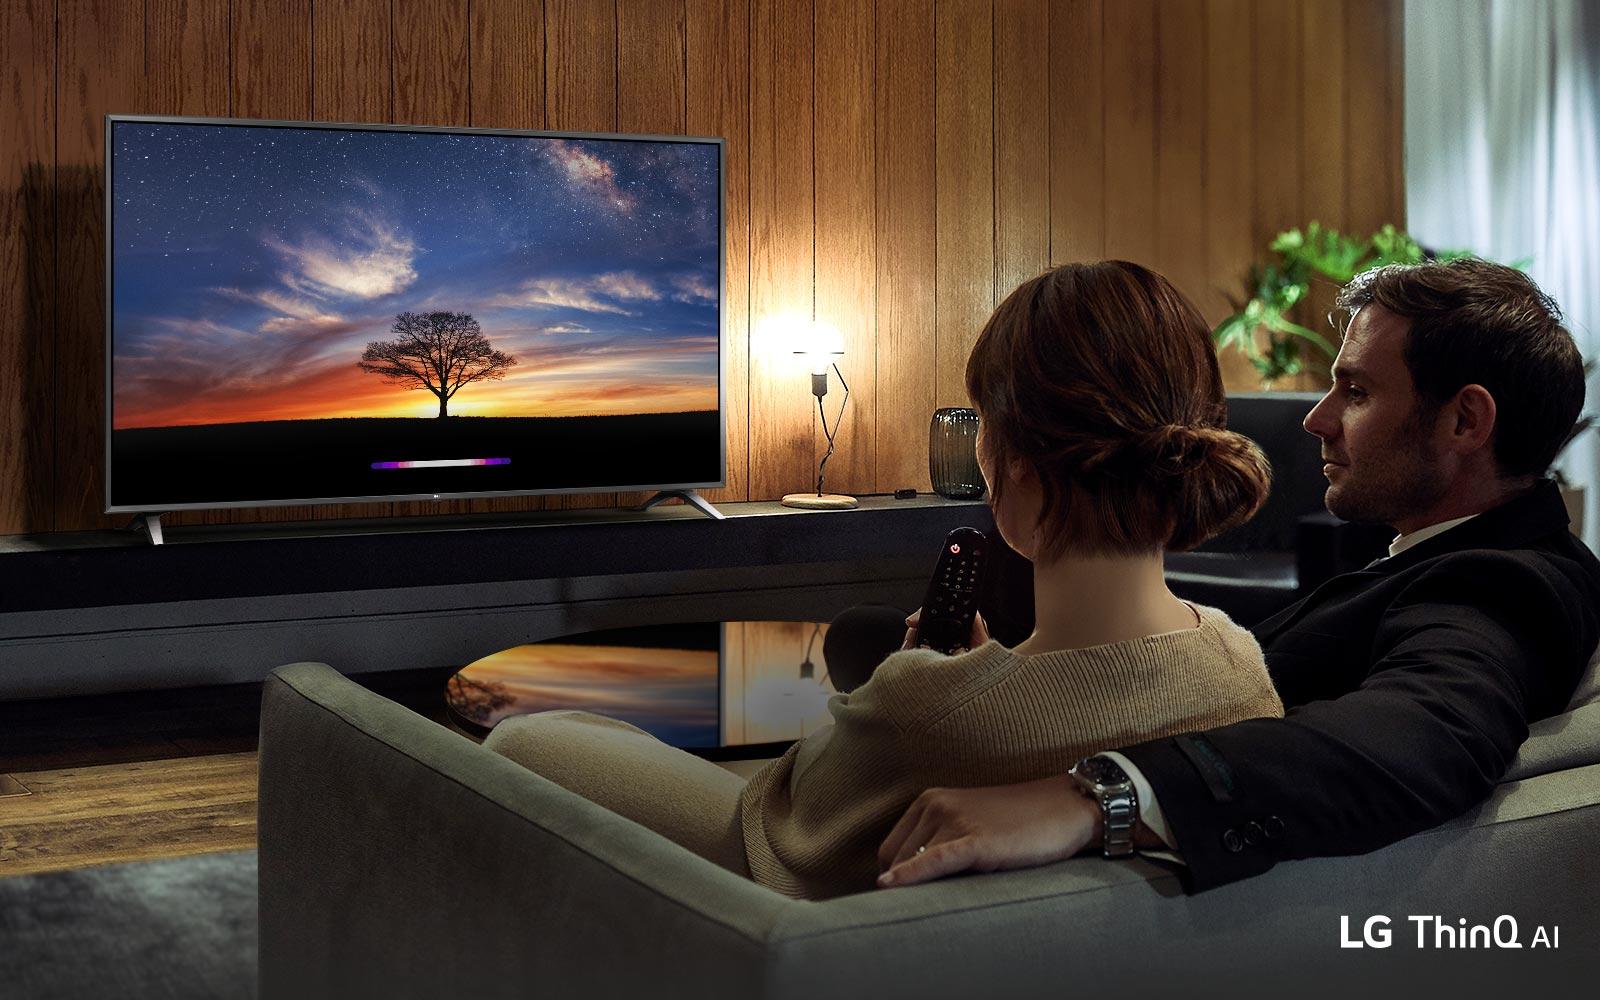 TV-UHD-49-UM73-01-AI-ThinQ-Desktop